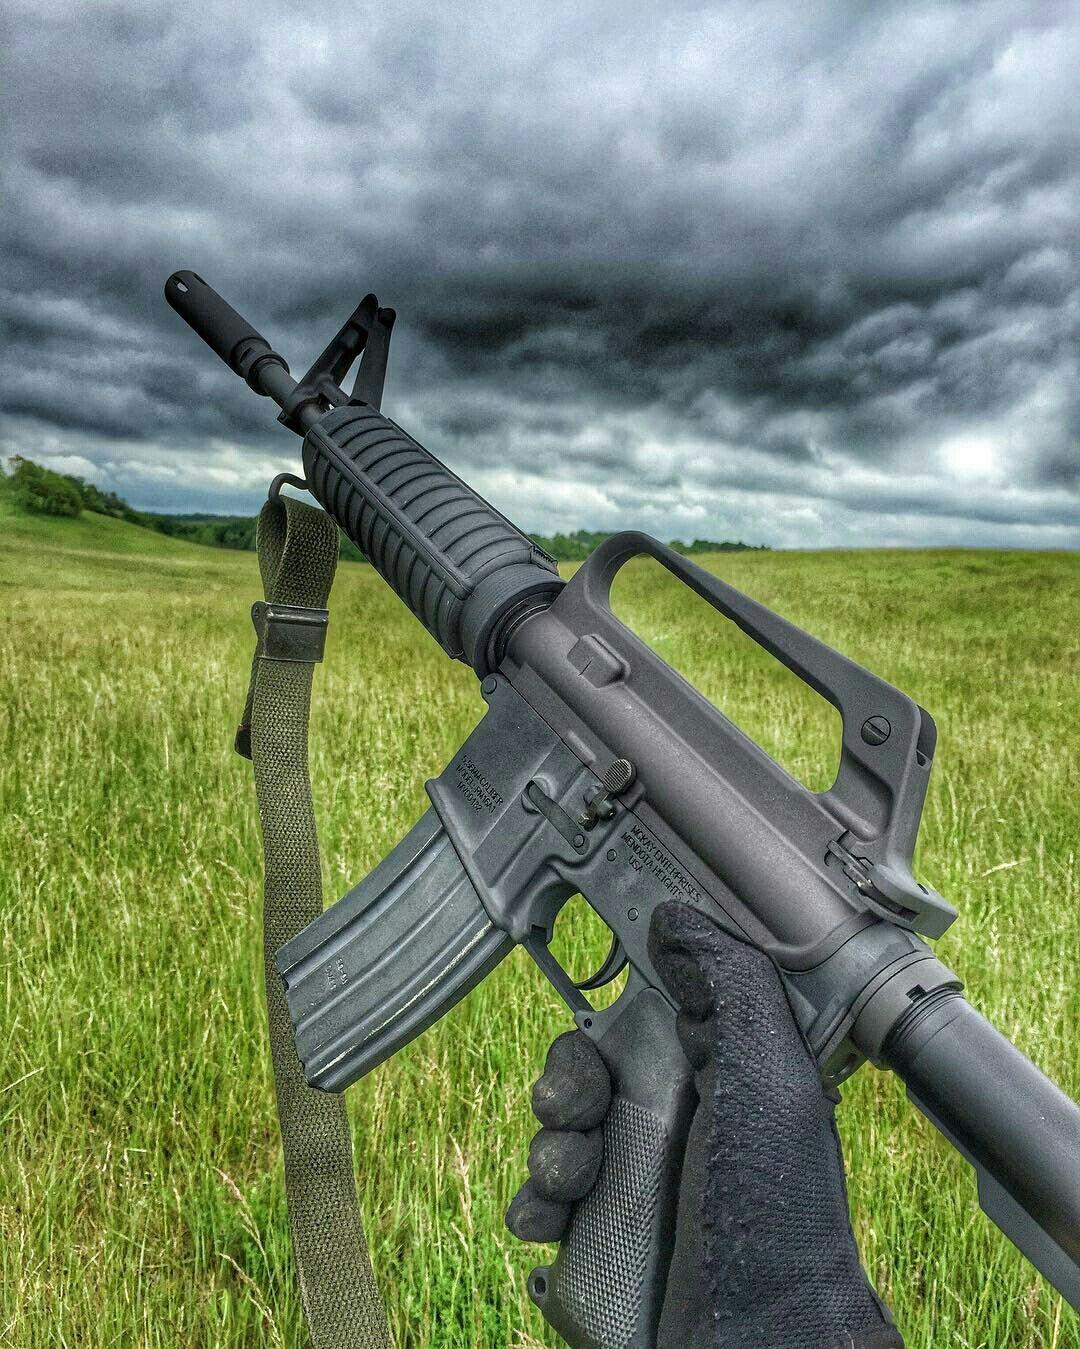 Pin de Derick Cosgrove en Pew! Pew! Pew! | Pinterest | Armas, Rifles ...